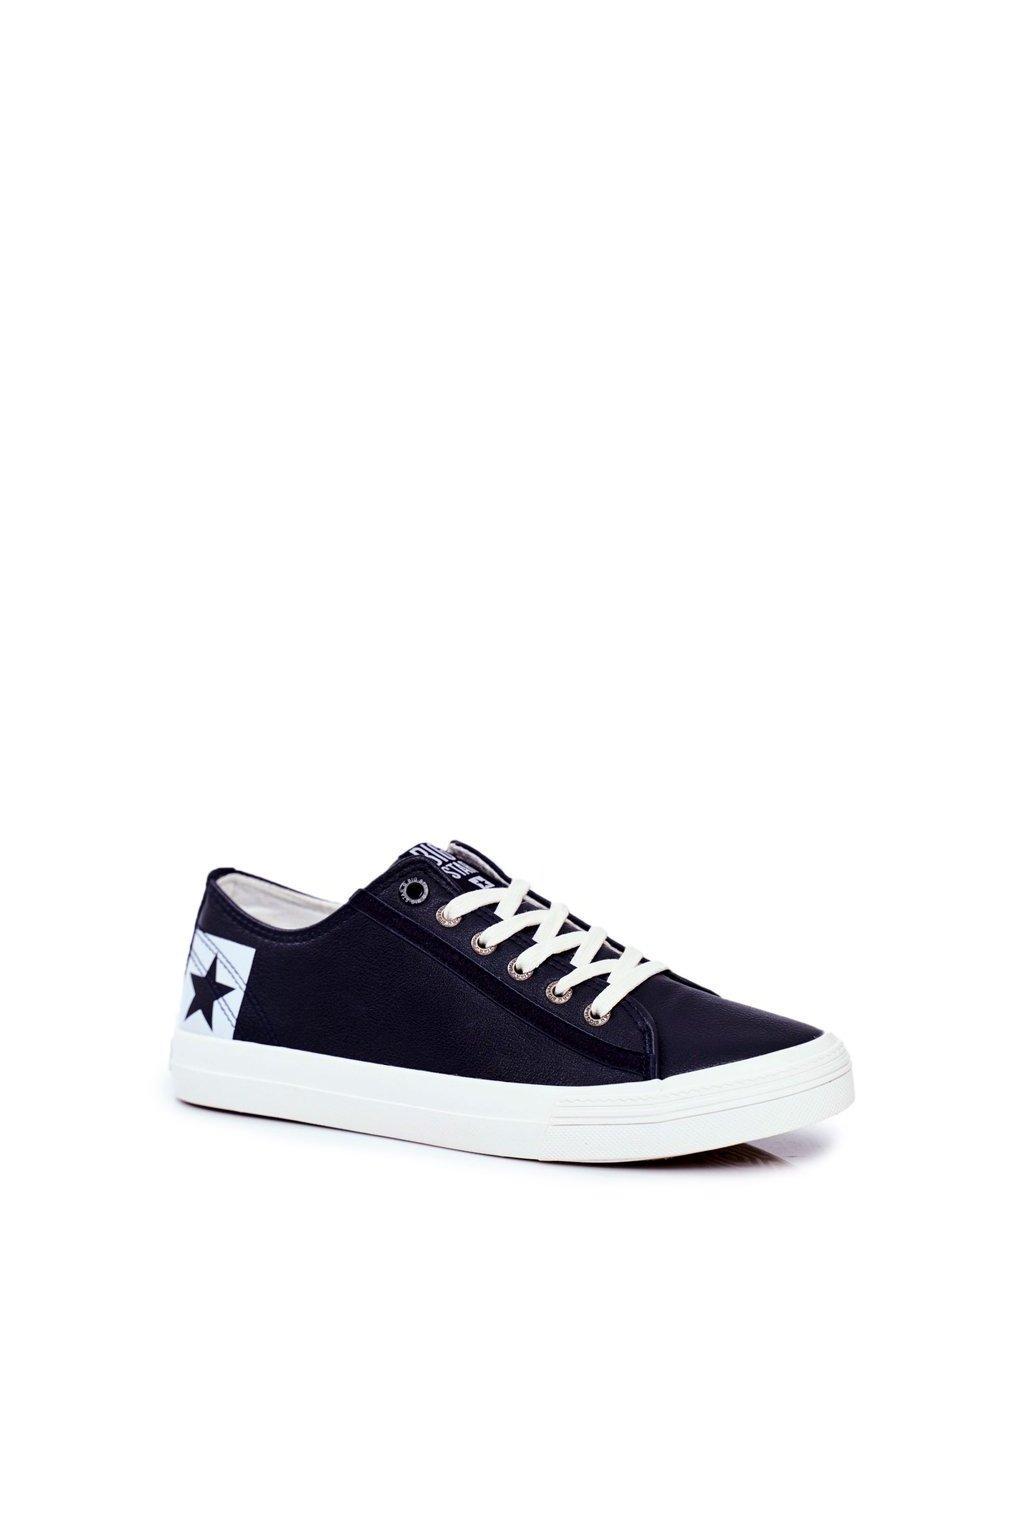 Modrá obuv kód topánok EE174159